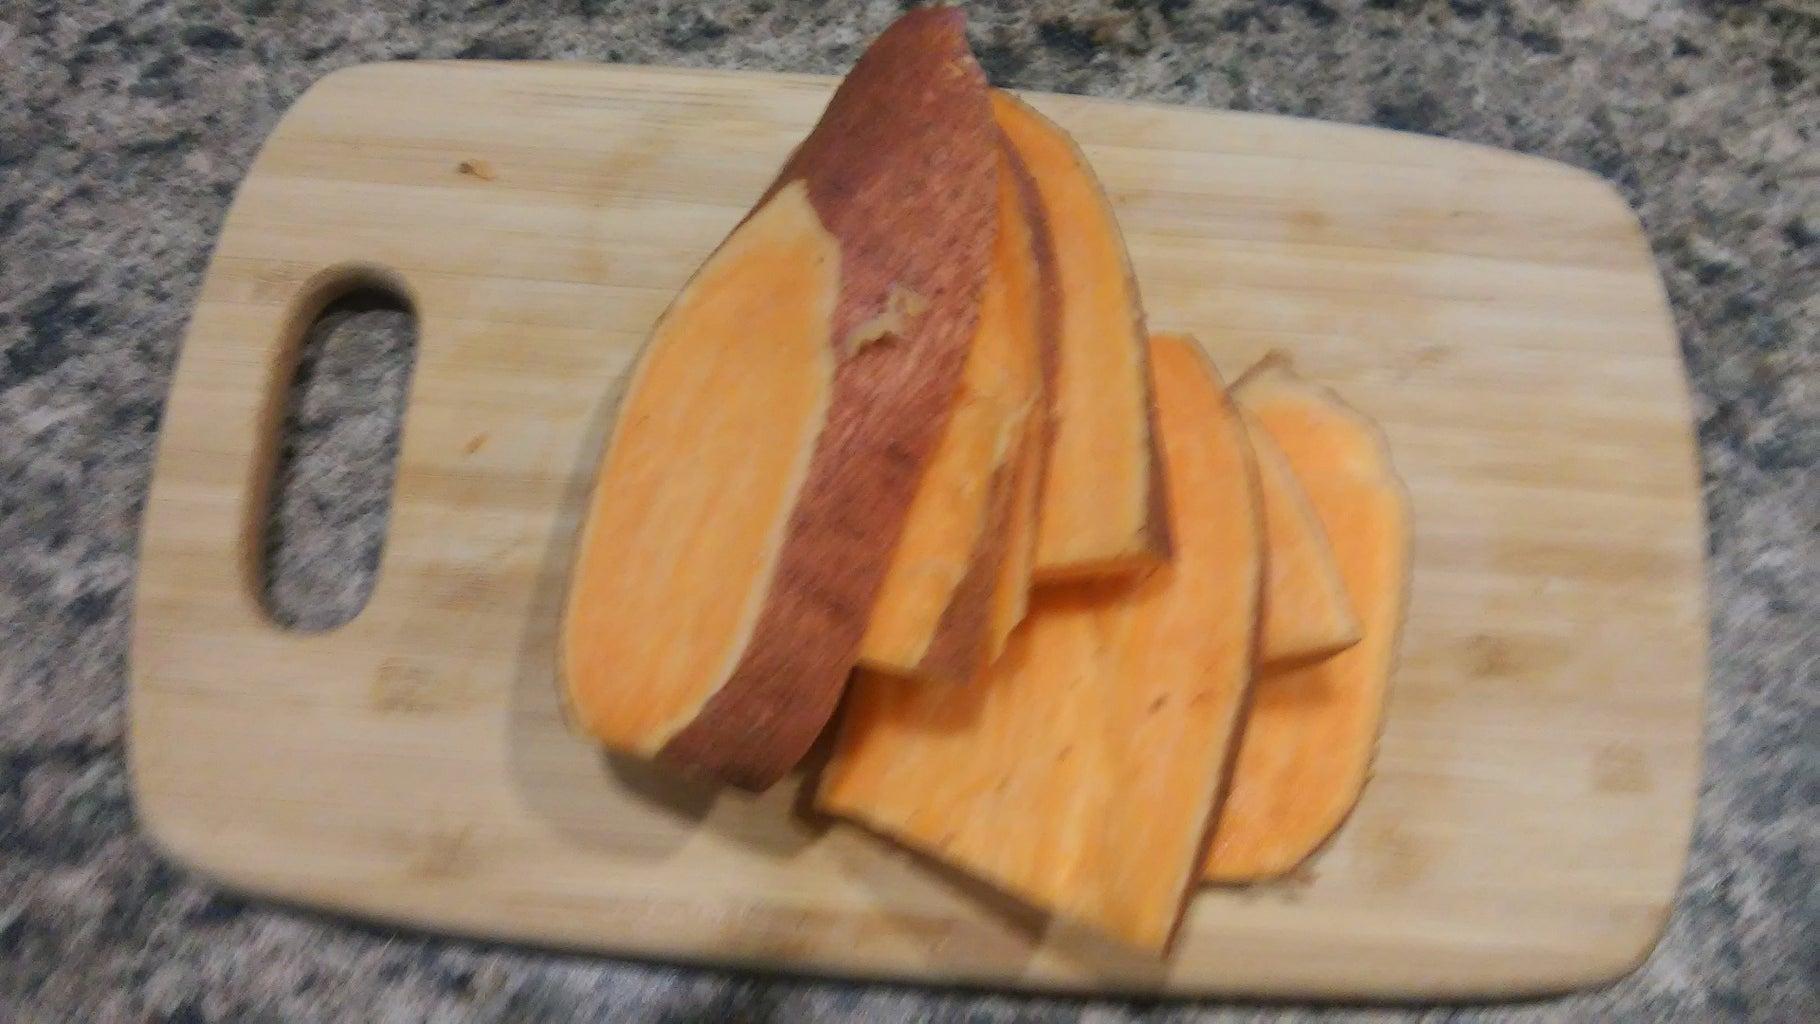 Cut Up the Sweet Potato